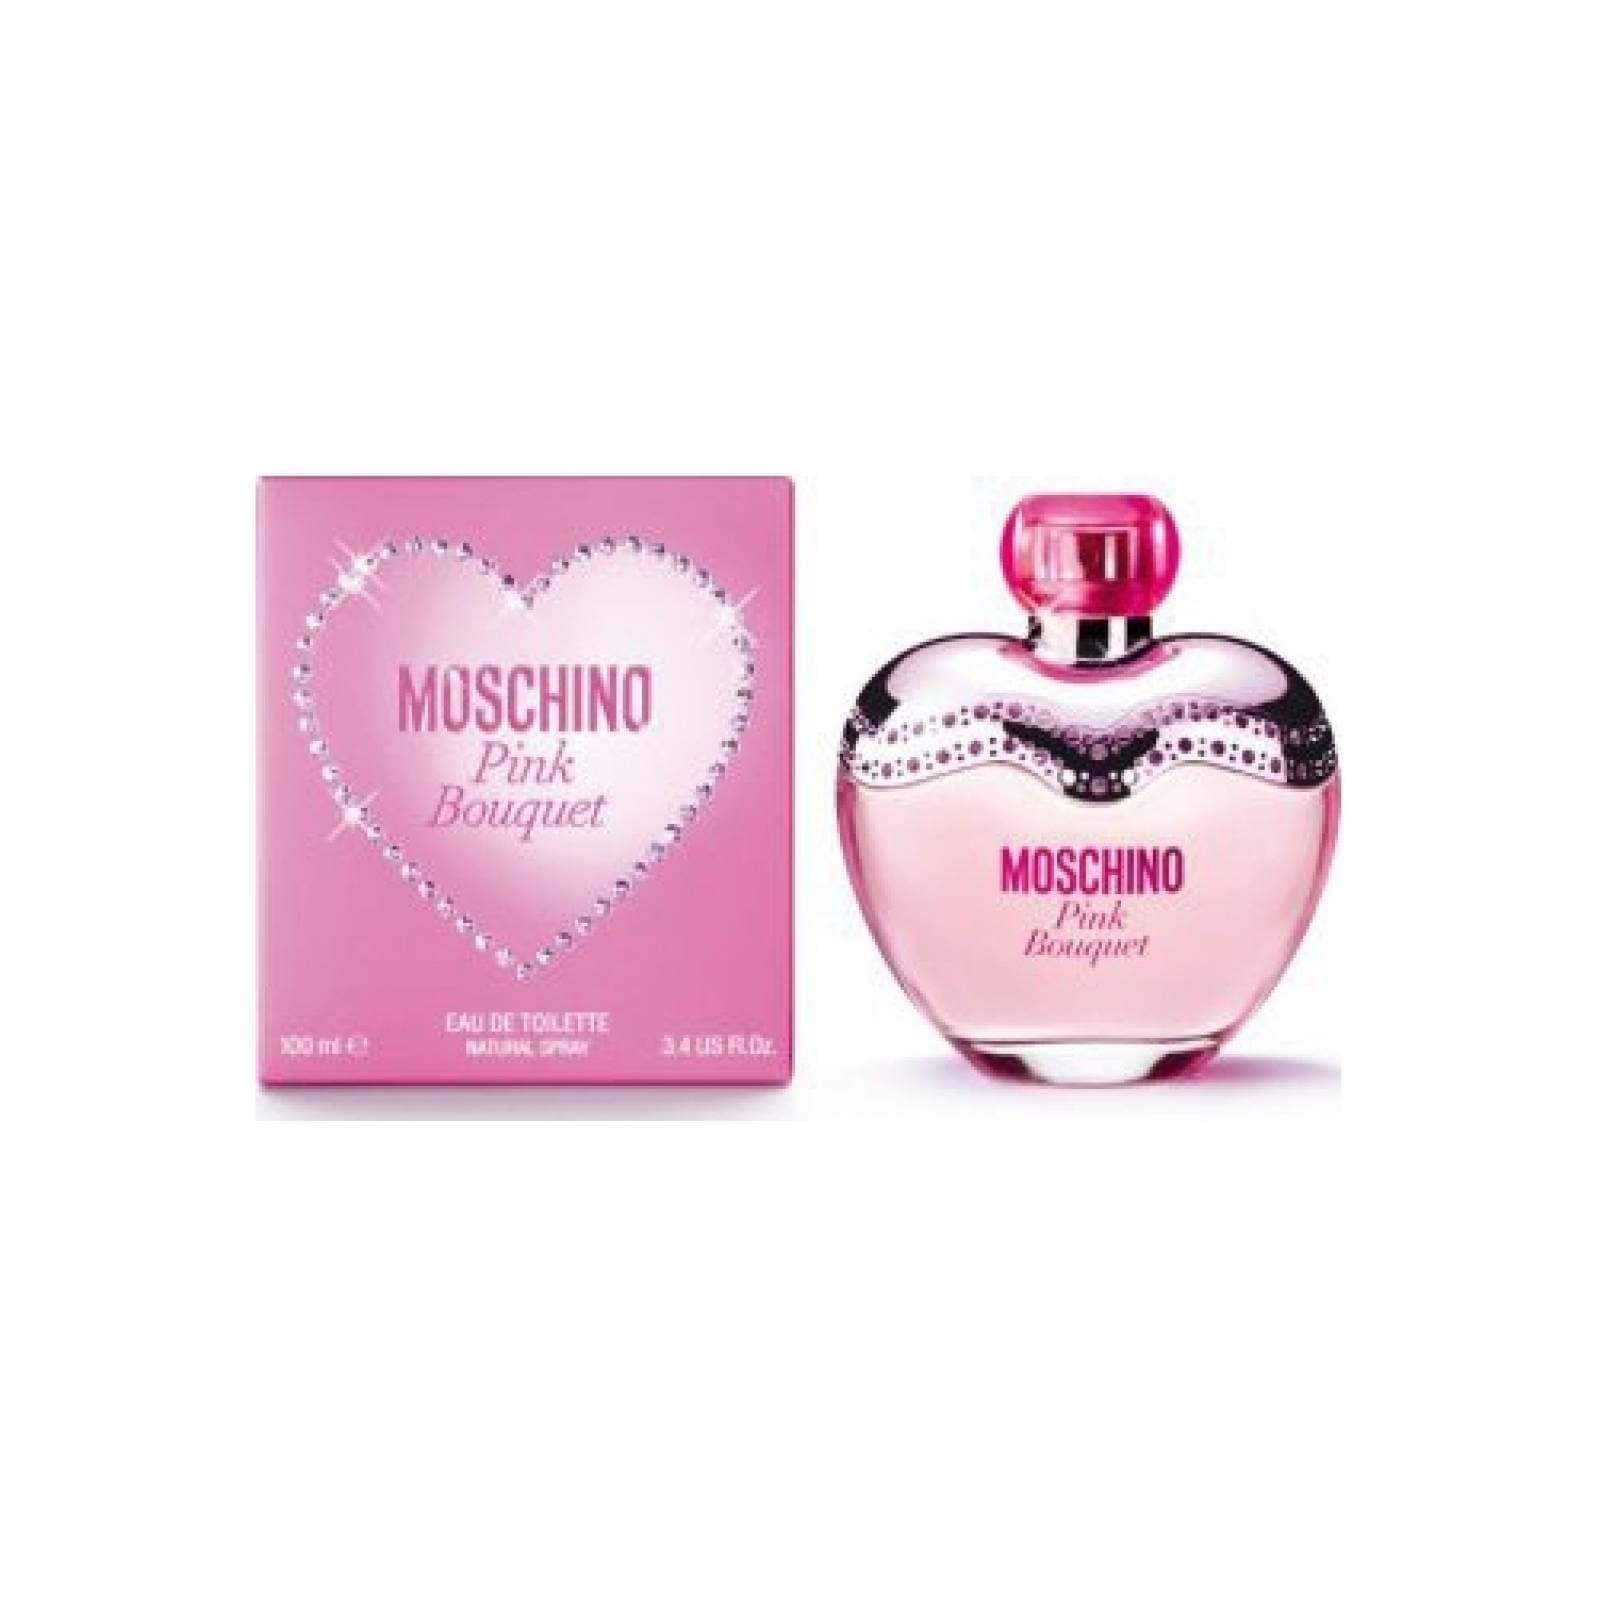 Pink Bouquet de Moschino Eau de Toilette 100 ml Fragancia para Dama